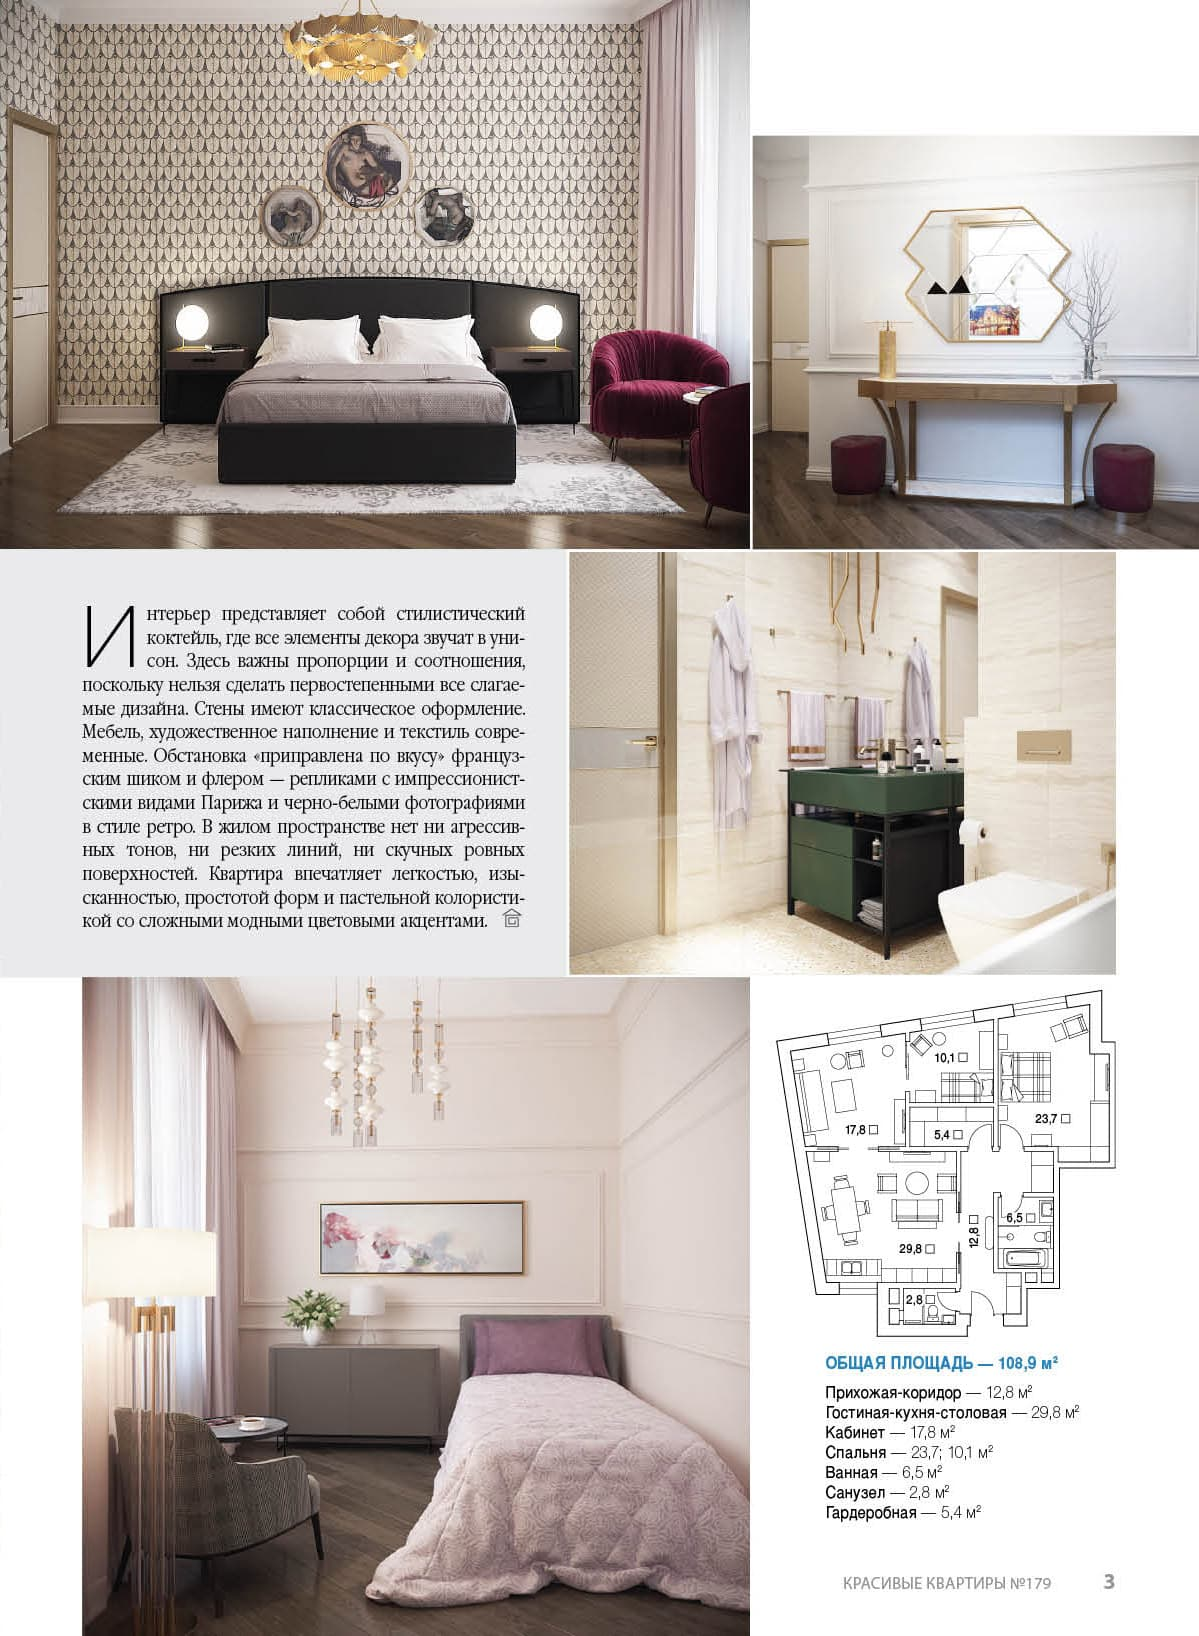 dizayn-proekt-s-francuzskim-flerom-02